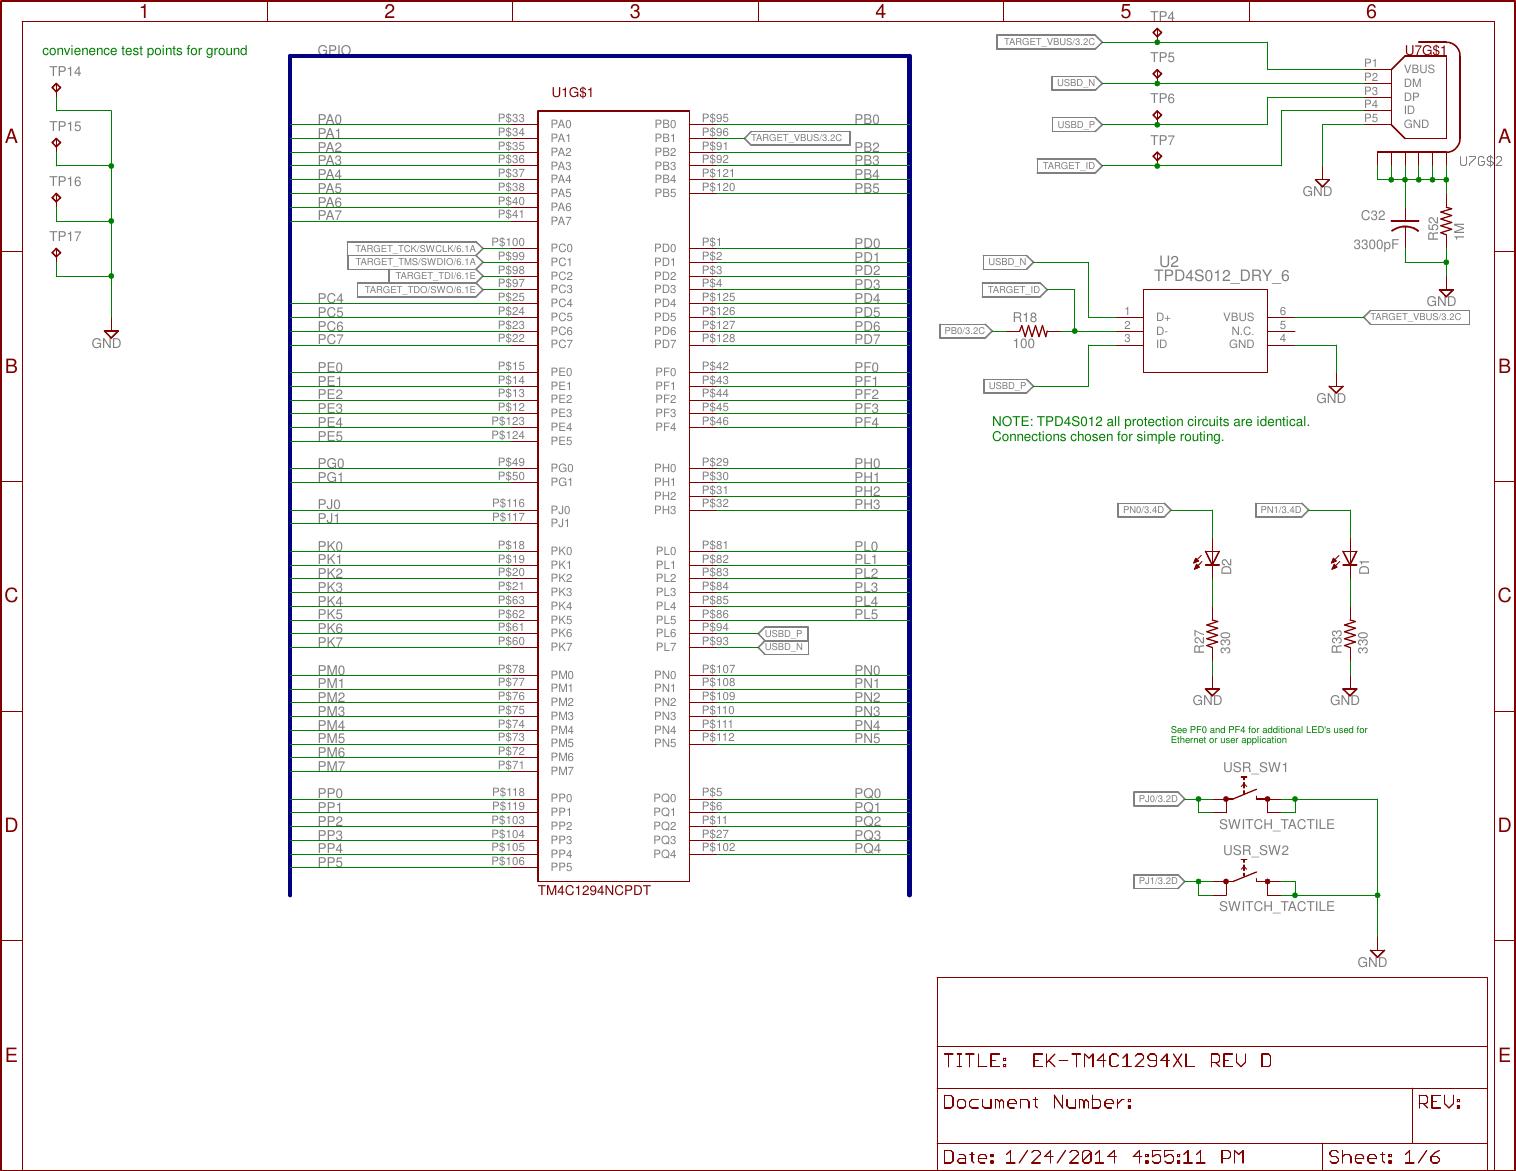 Tiva™ C Series TM4C1294 Connected LaunchPad Evaluation Kit (Rev  B